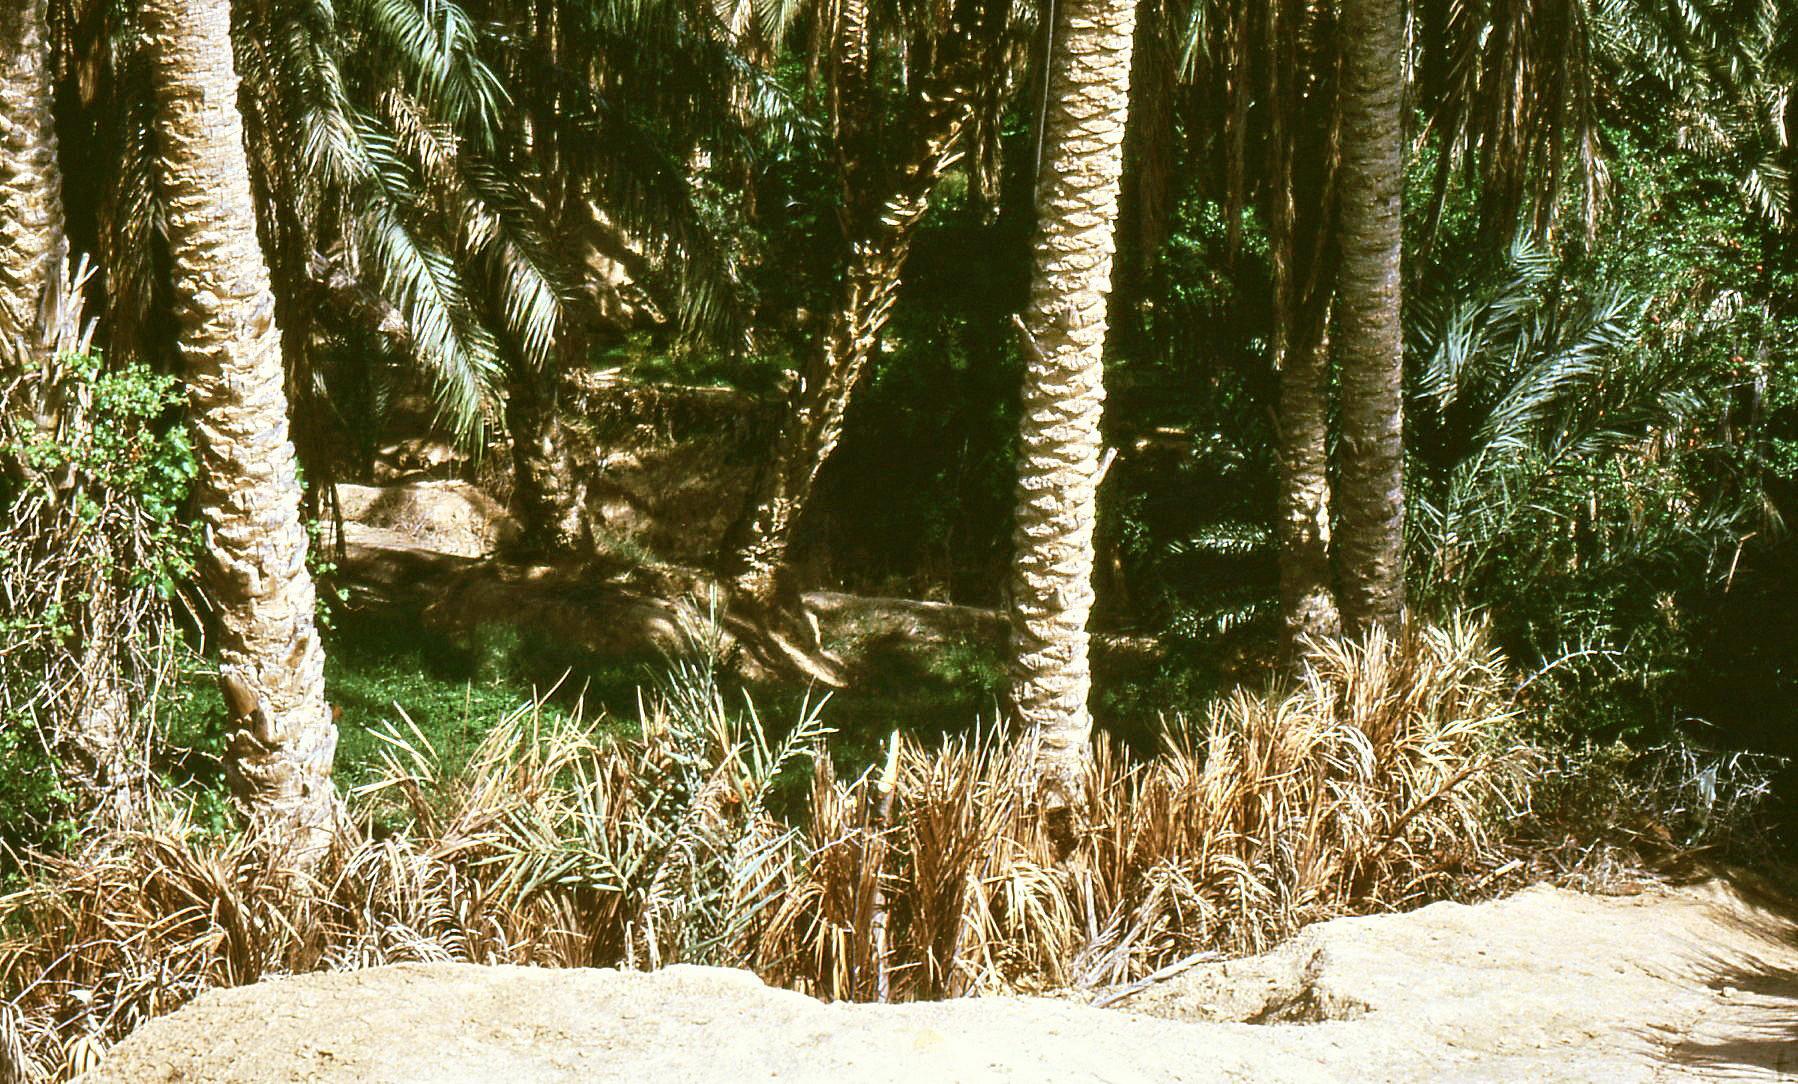 Barriere vegetali protettive nell'oasi